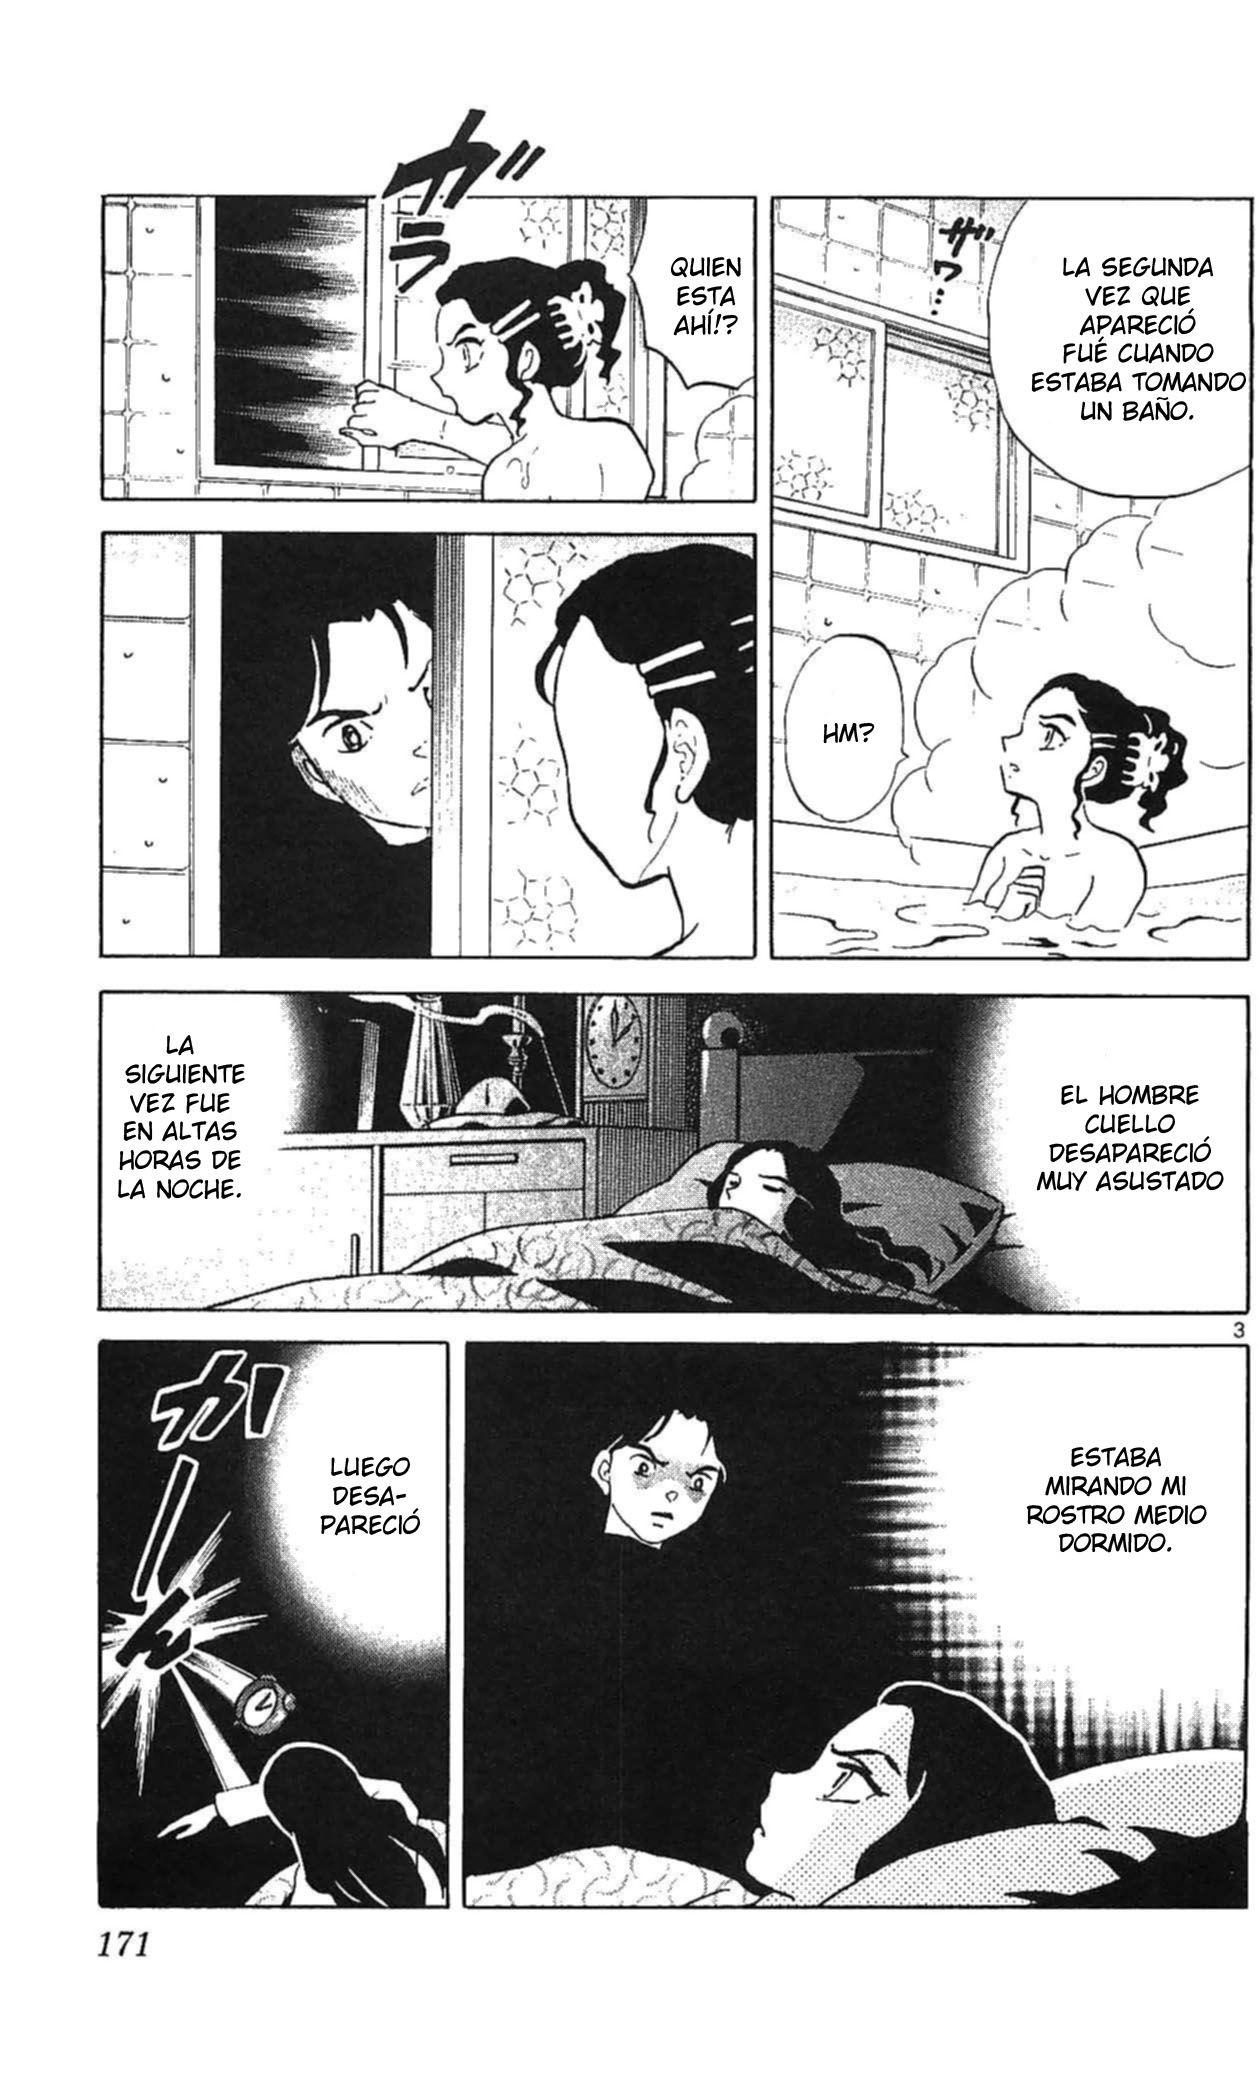 https://c5.ninemanga.com/es_manga/pic2/33/609/524744/f1d28af8c8d21575eb00e70075b5d1de.jpg Page 4